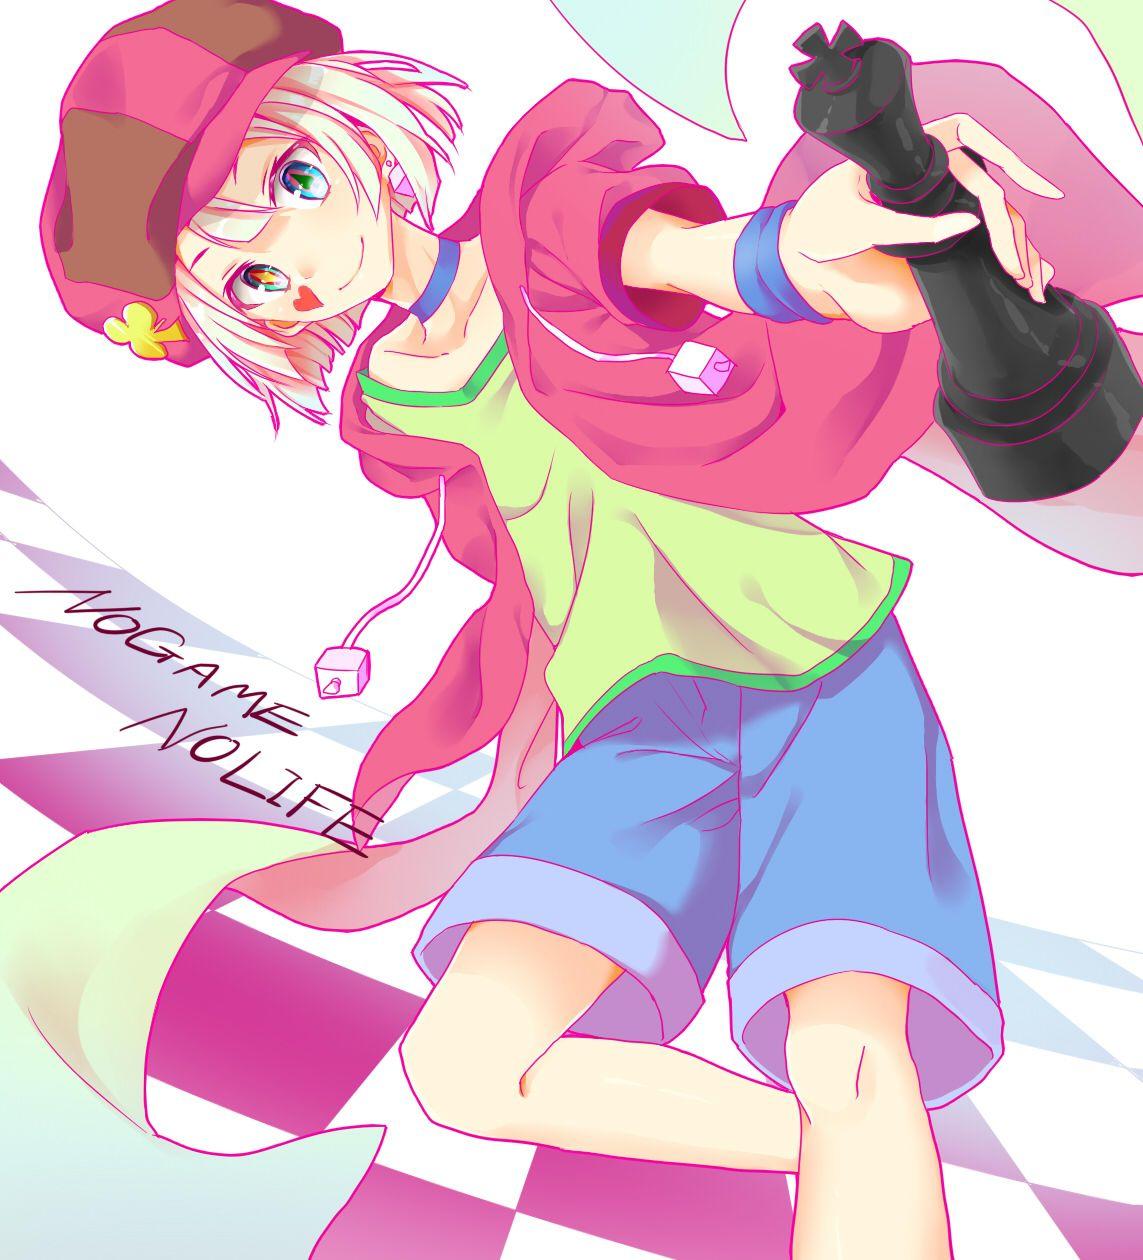 Ngnl テト まののイラスト No Game No Life Manga Games Anime